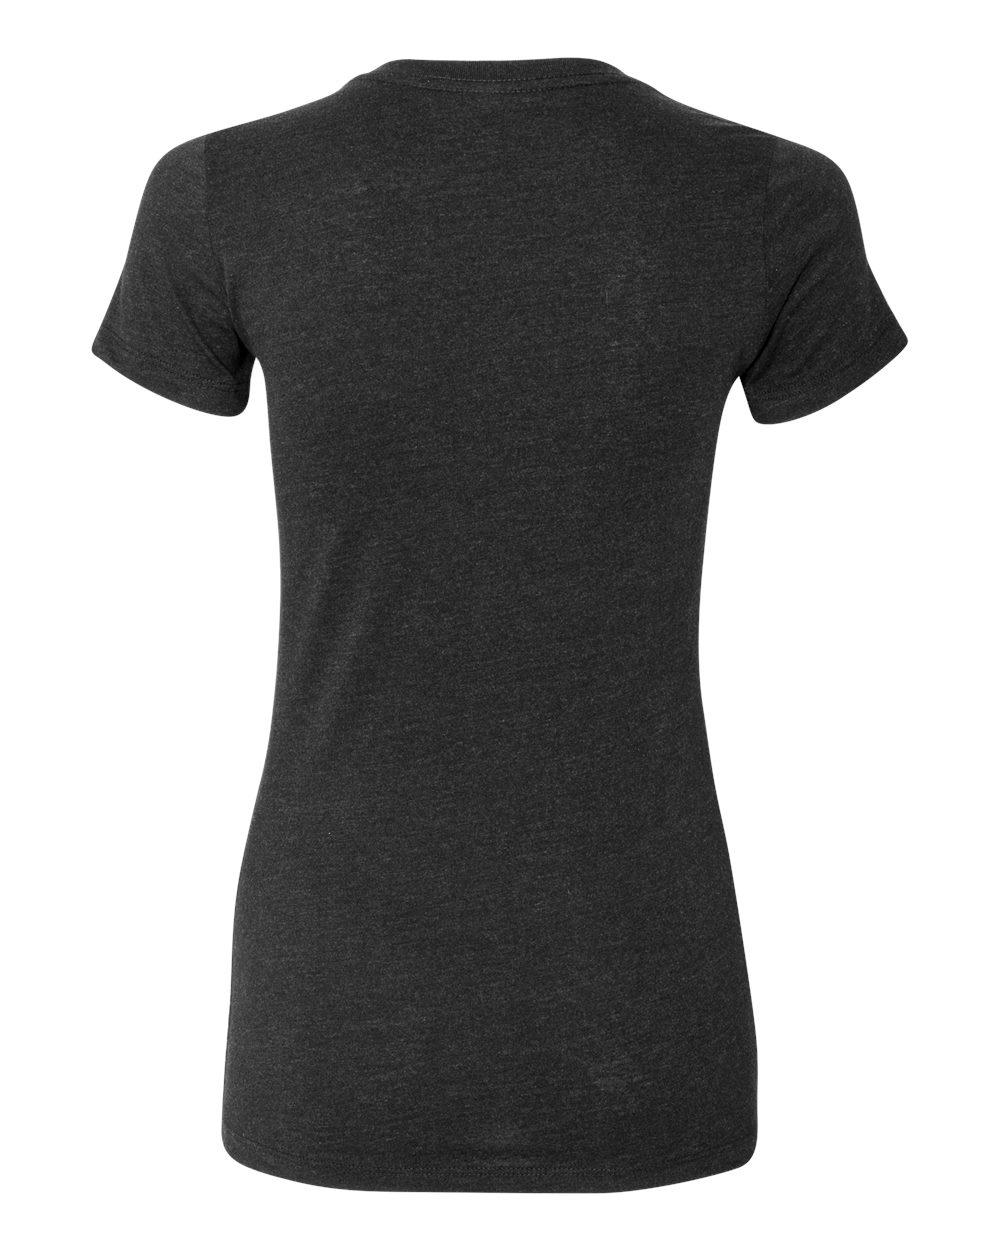 Bella-Canvas-Women-039-s-Favorite-T-Shirt-6004-S-2XL thumbnail 151